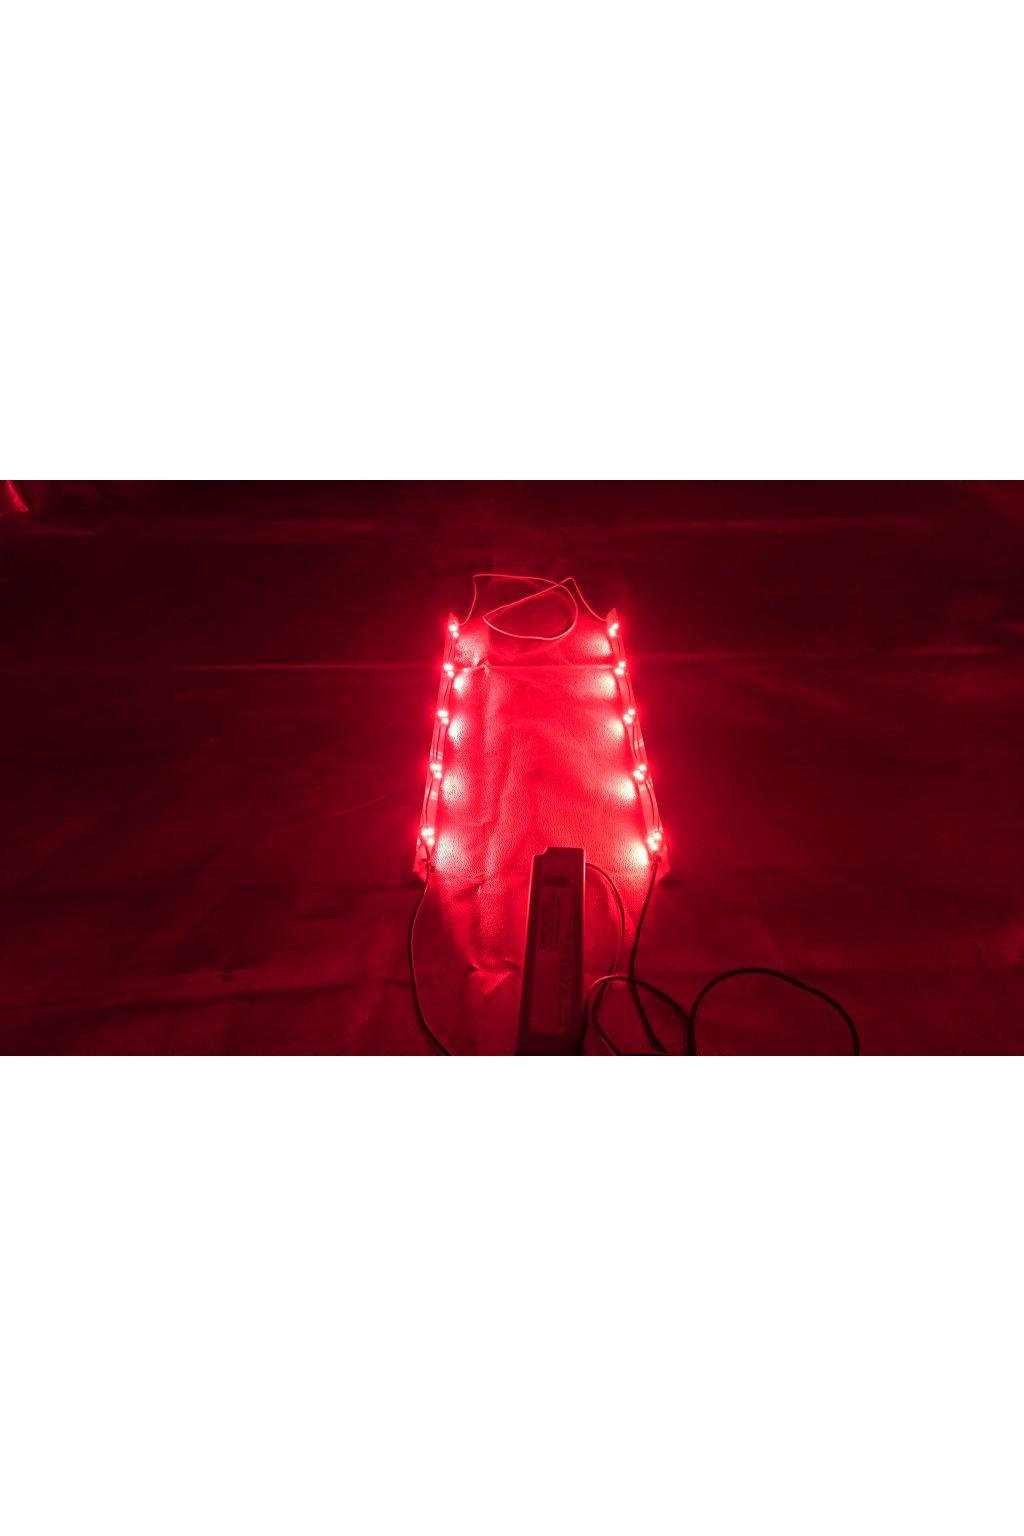 Cree red 660 nm 30 ks/50W